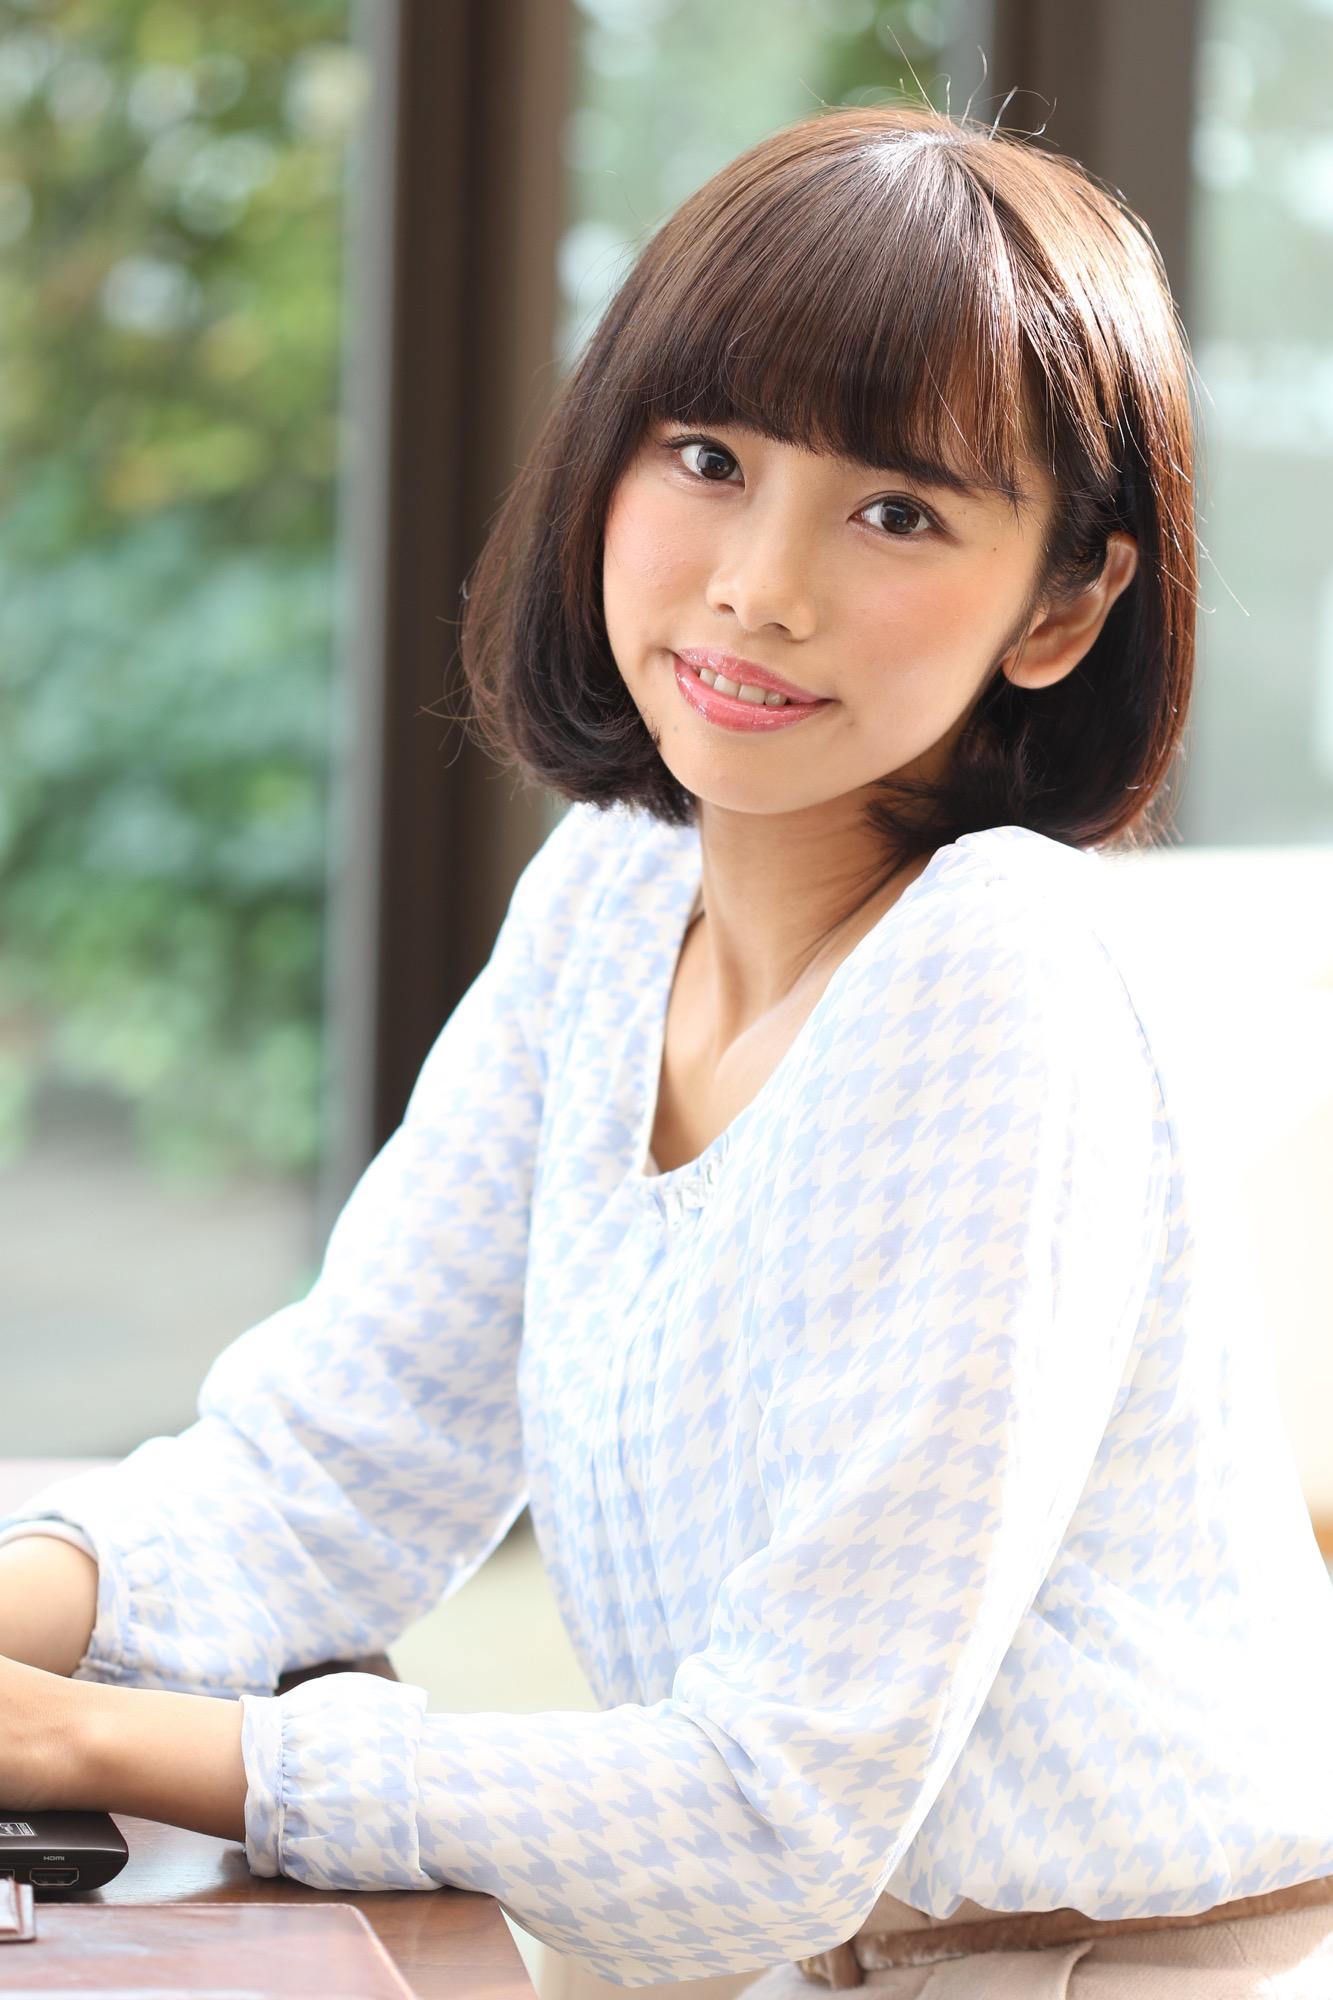 MBA(経営学修士)/ファイナンシャルプランナー【横川 楓】